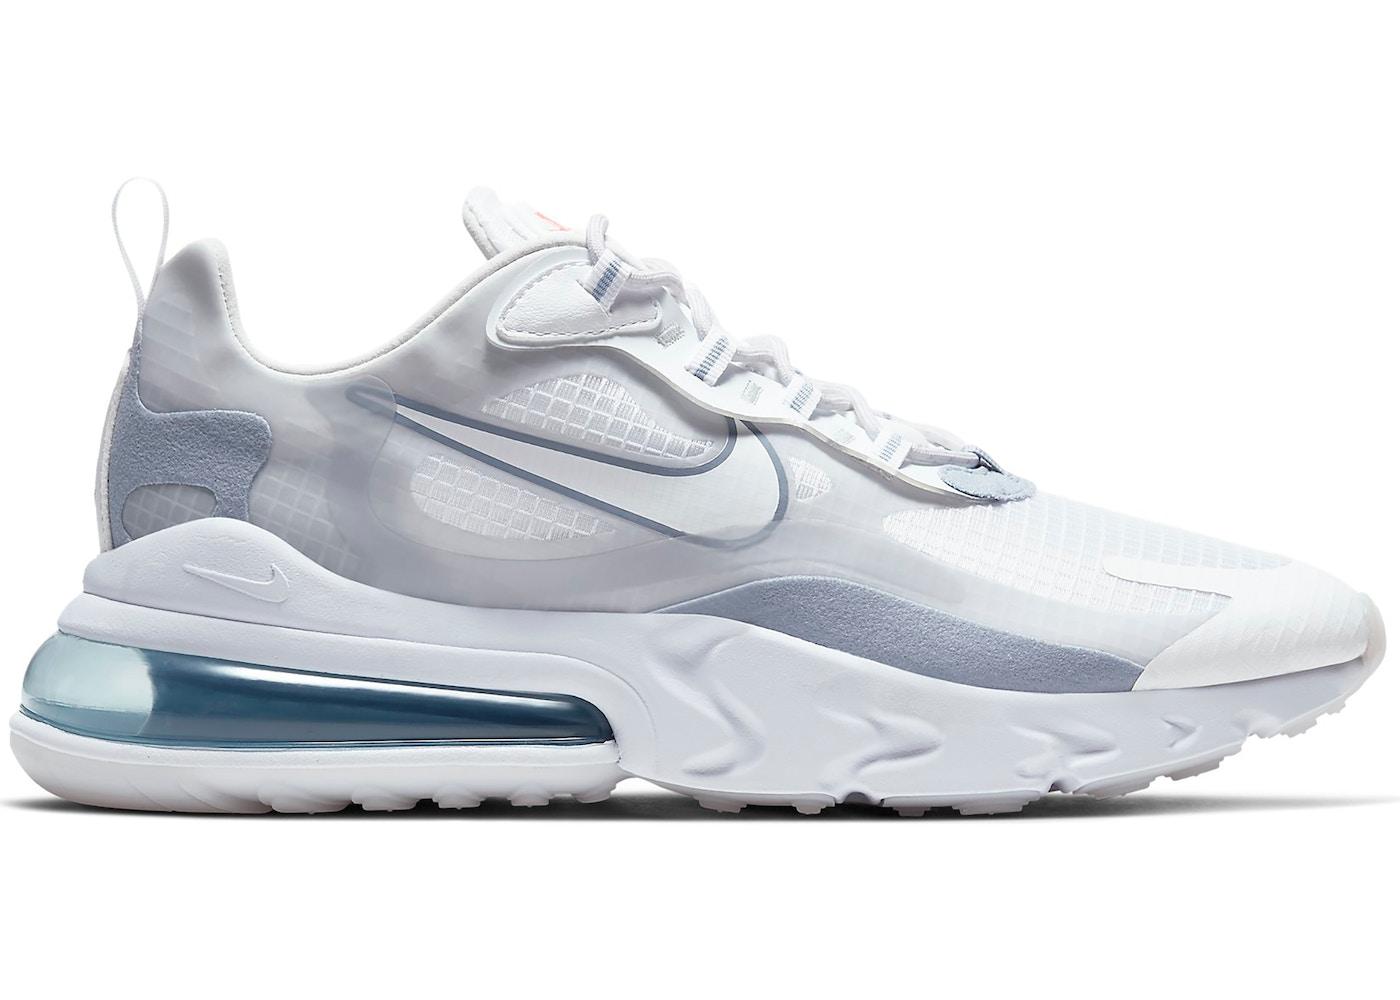 venta profesional desigual en el rendimiento grandes variedades Nike Air Max 270 React White Pure Platinum - CT1265-100